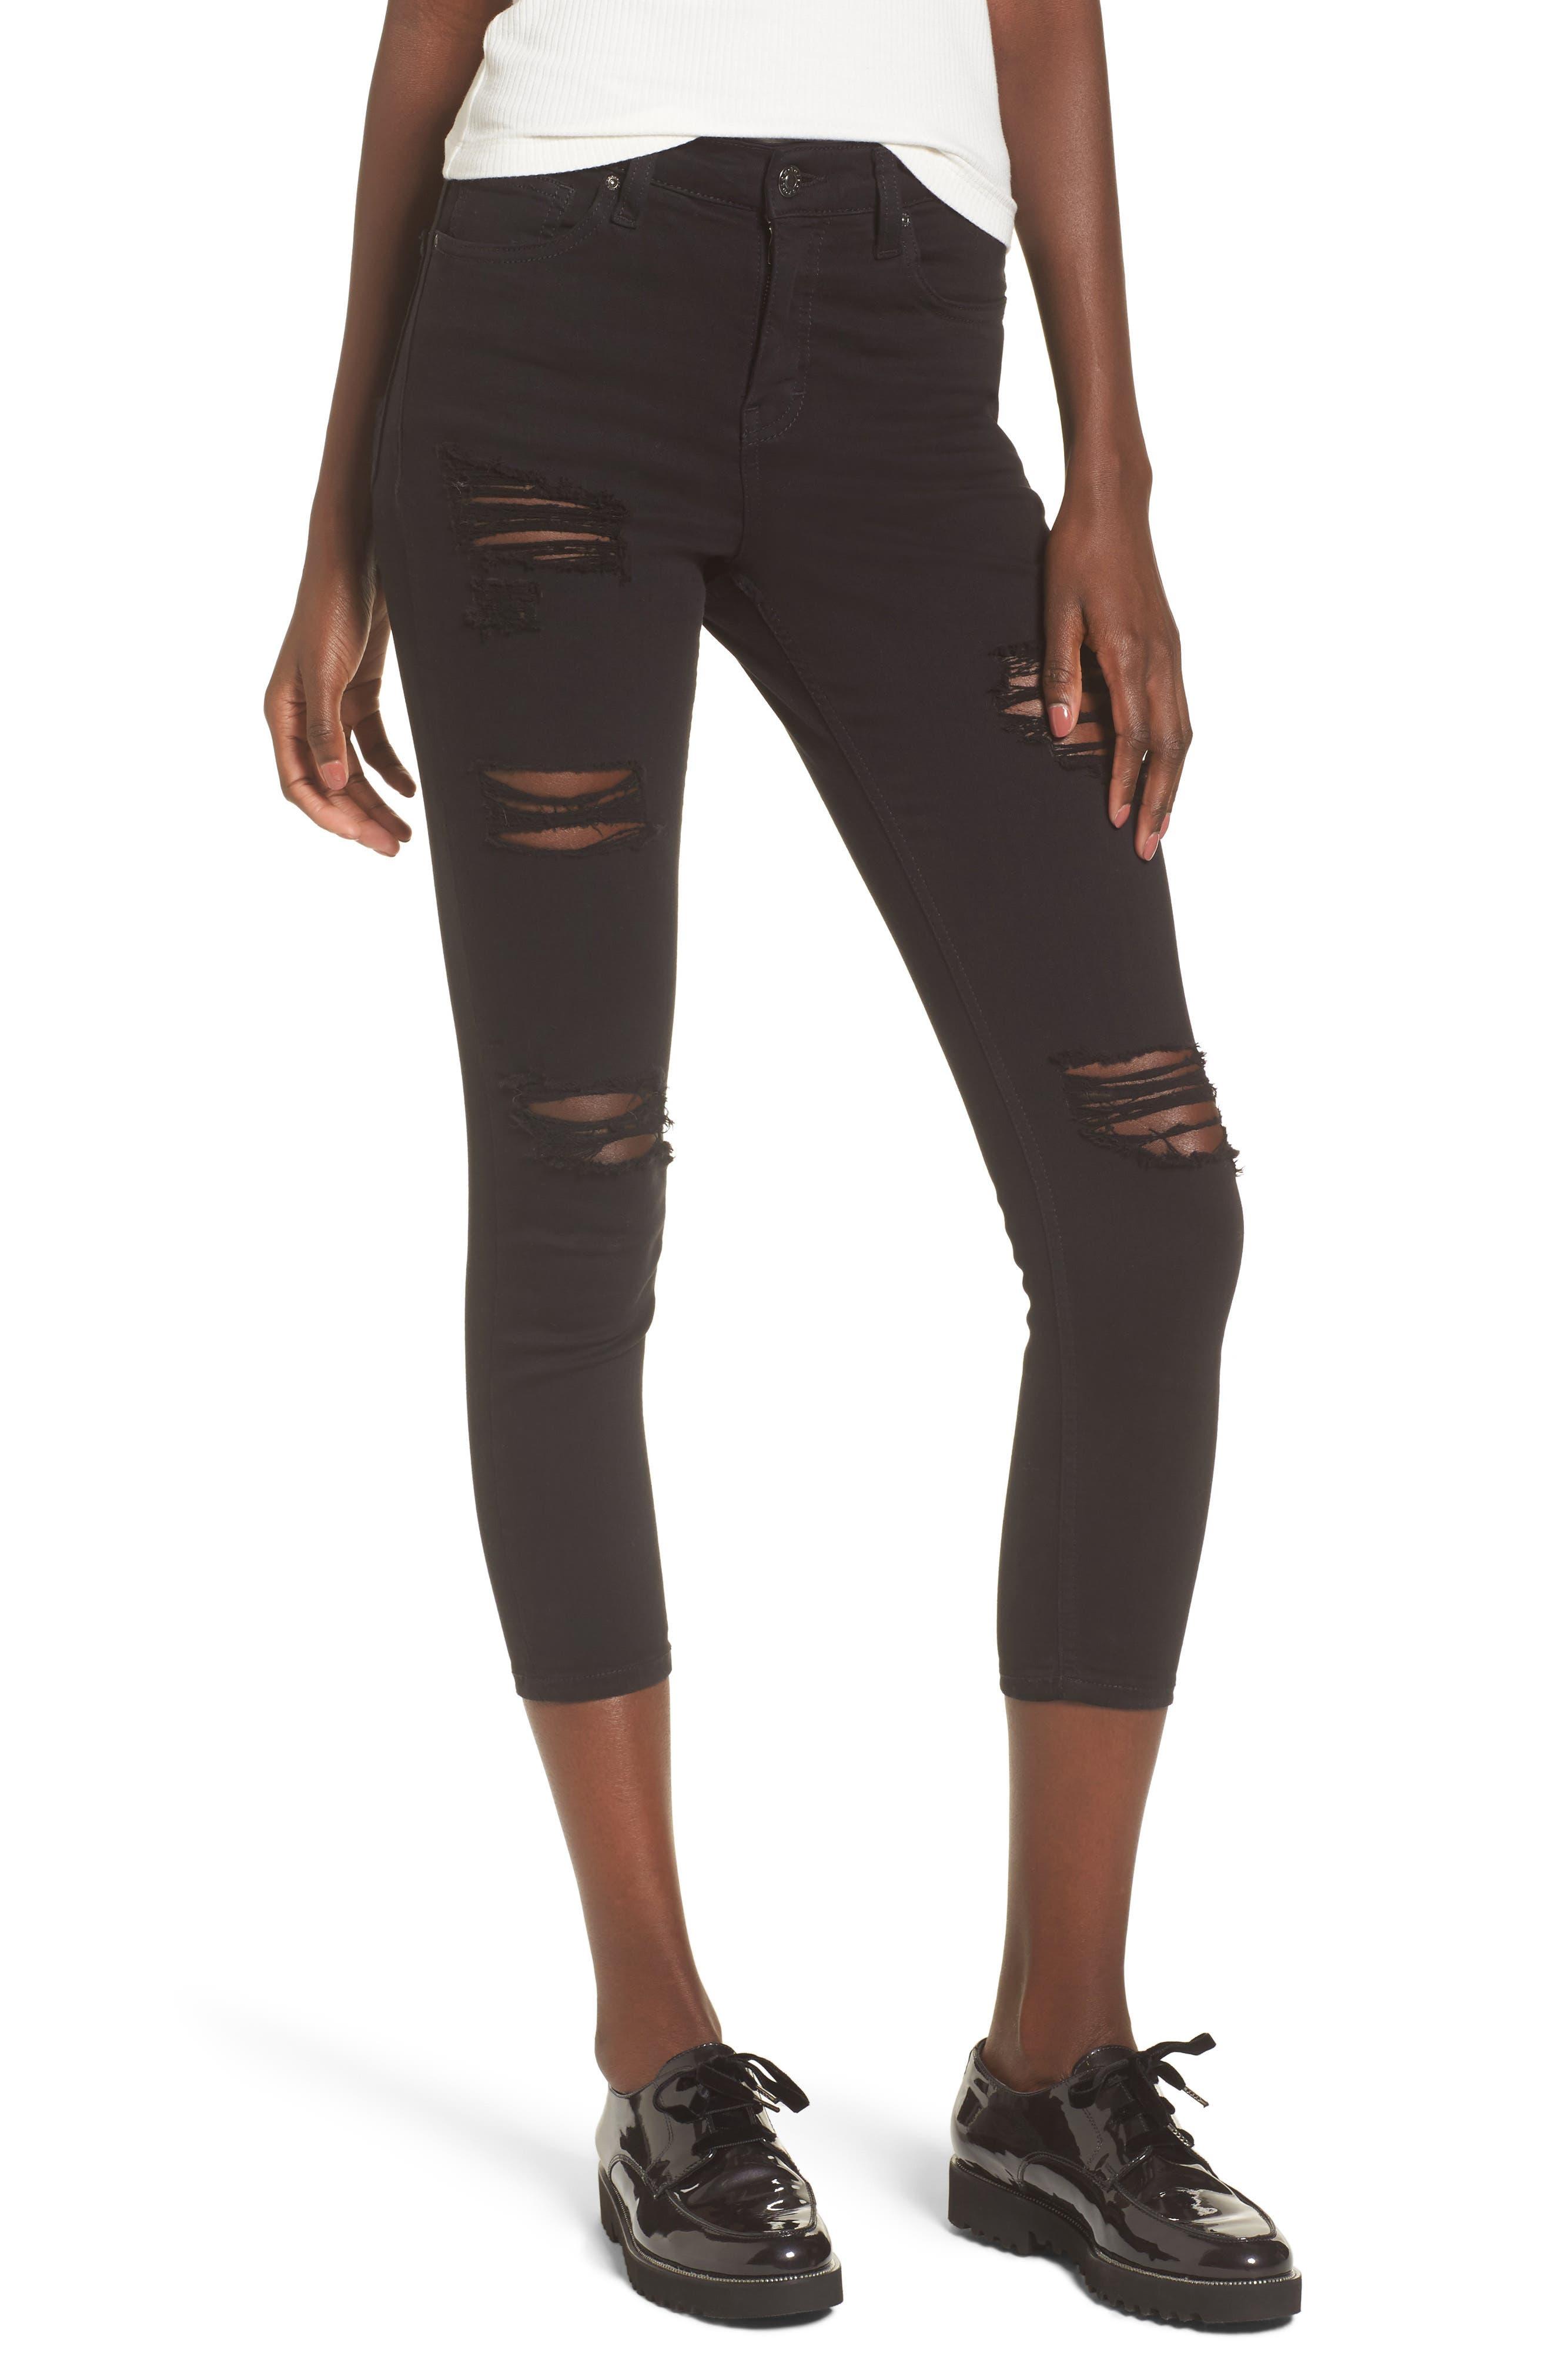 TOPSHOP, Moto 'Jamie' Ripped Skinny Jeans, Main thumbnail 1, color, 001